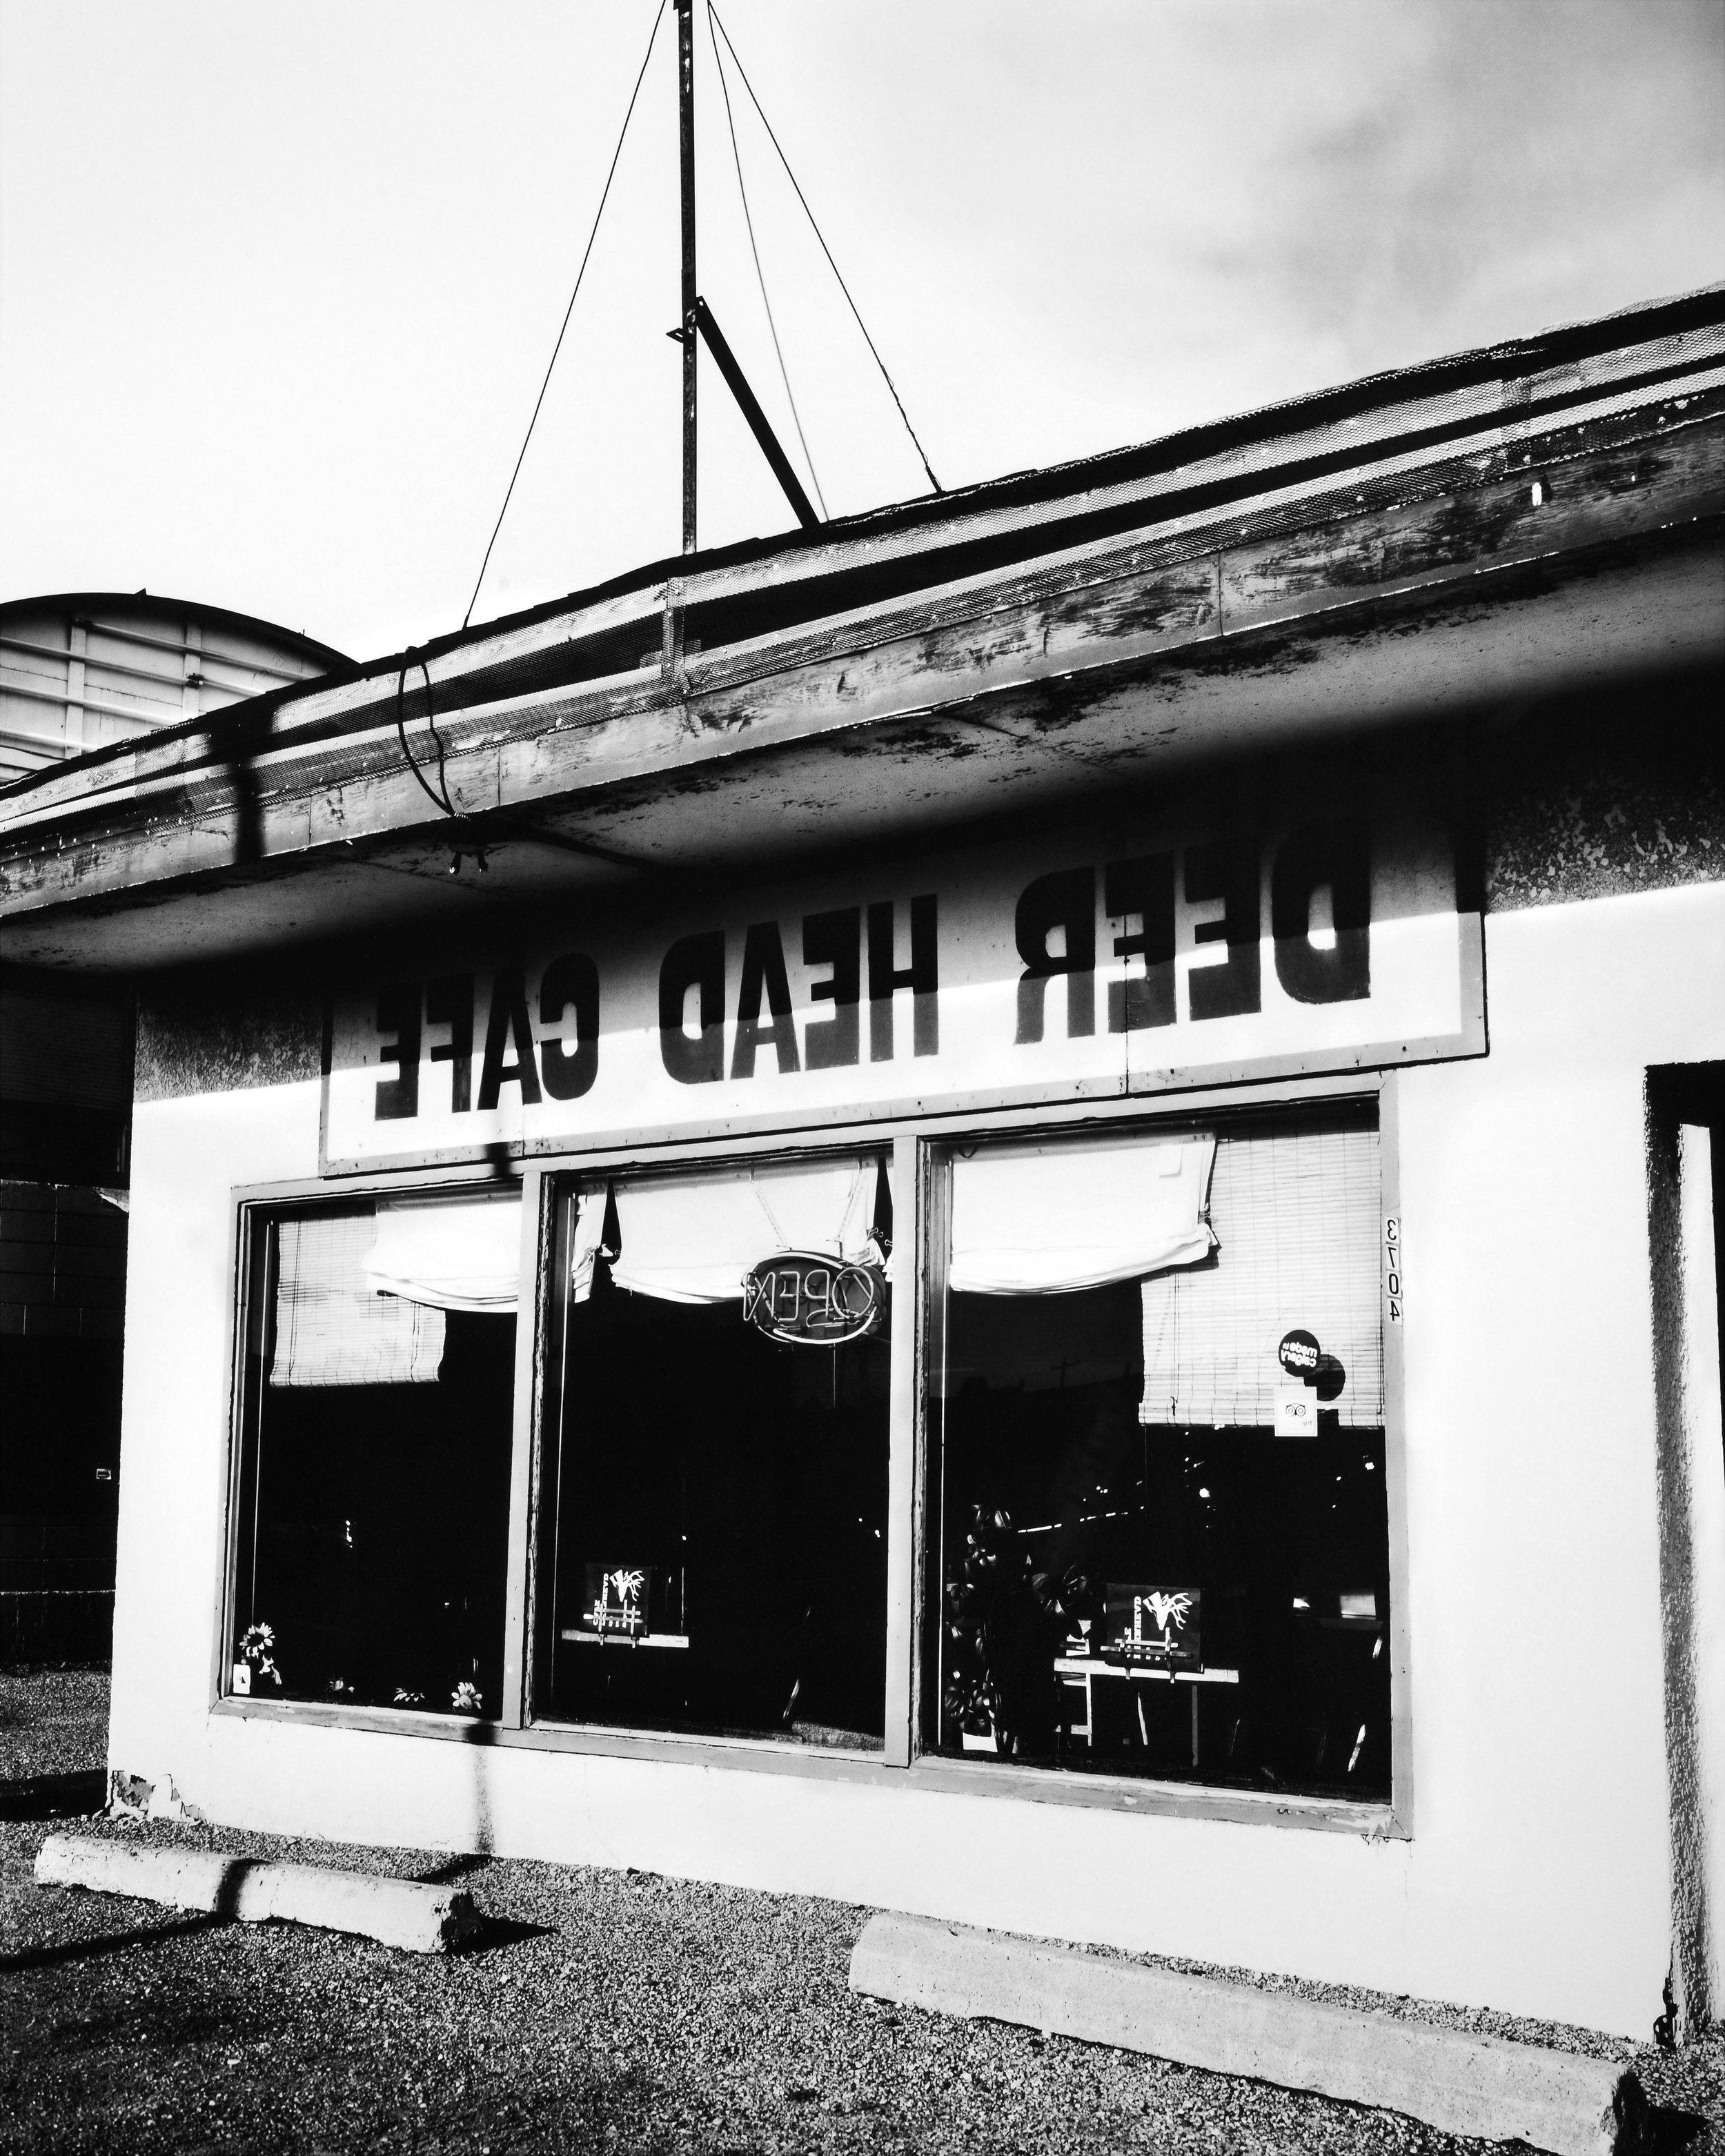 Reproduction - Deer Head Cafe - Print - No Border.jpg